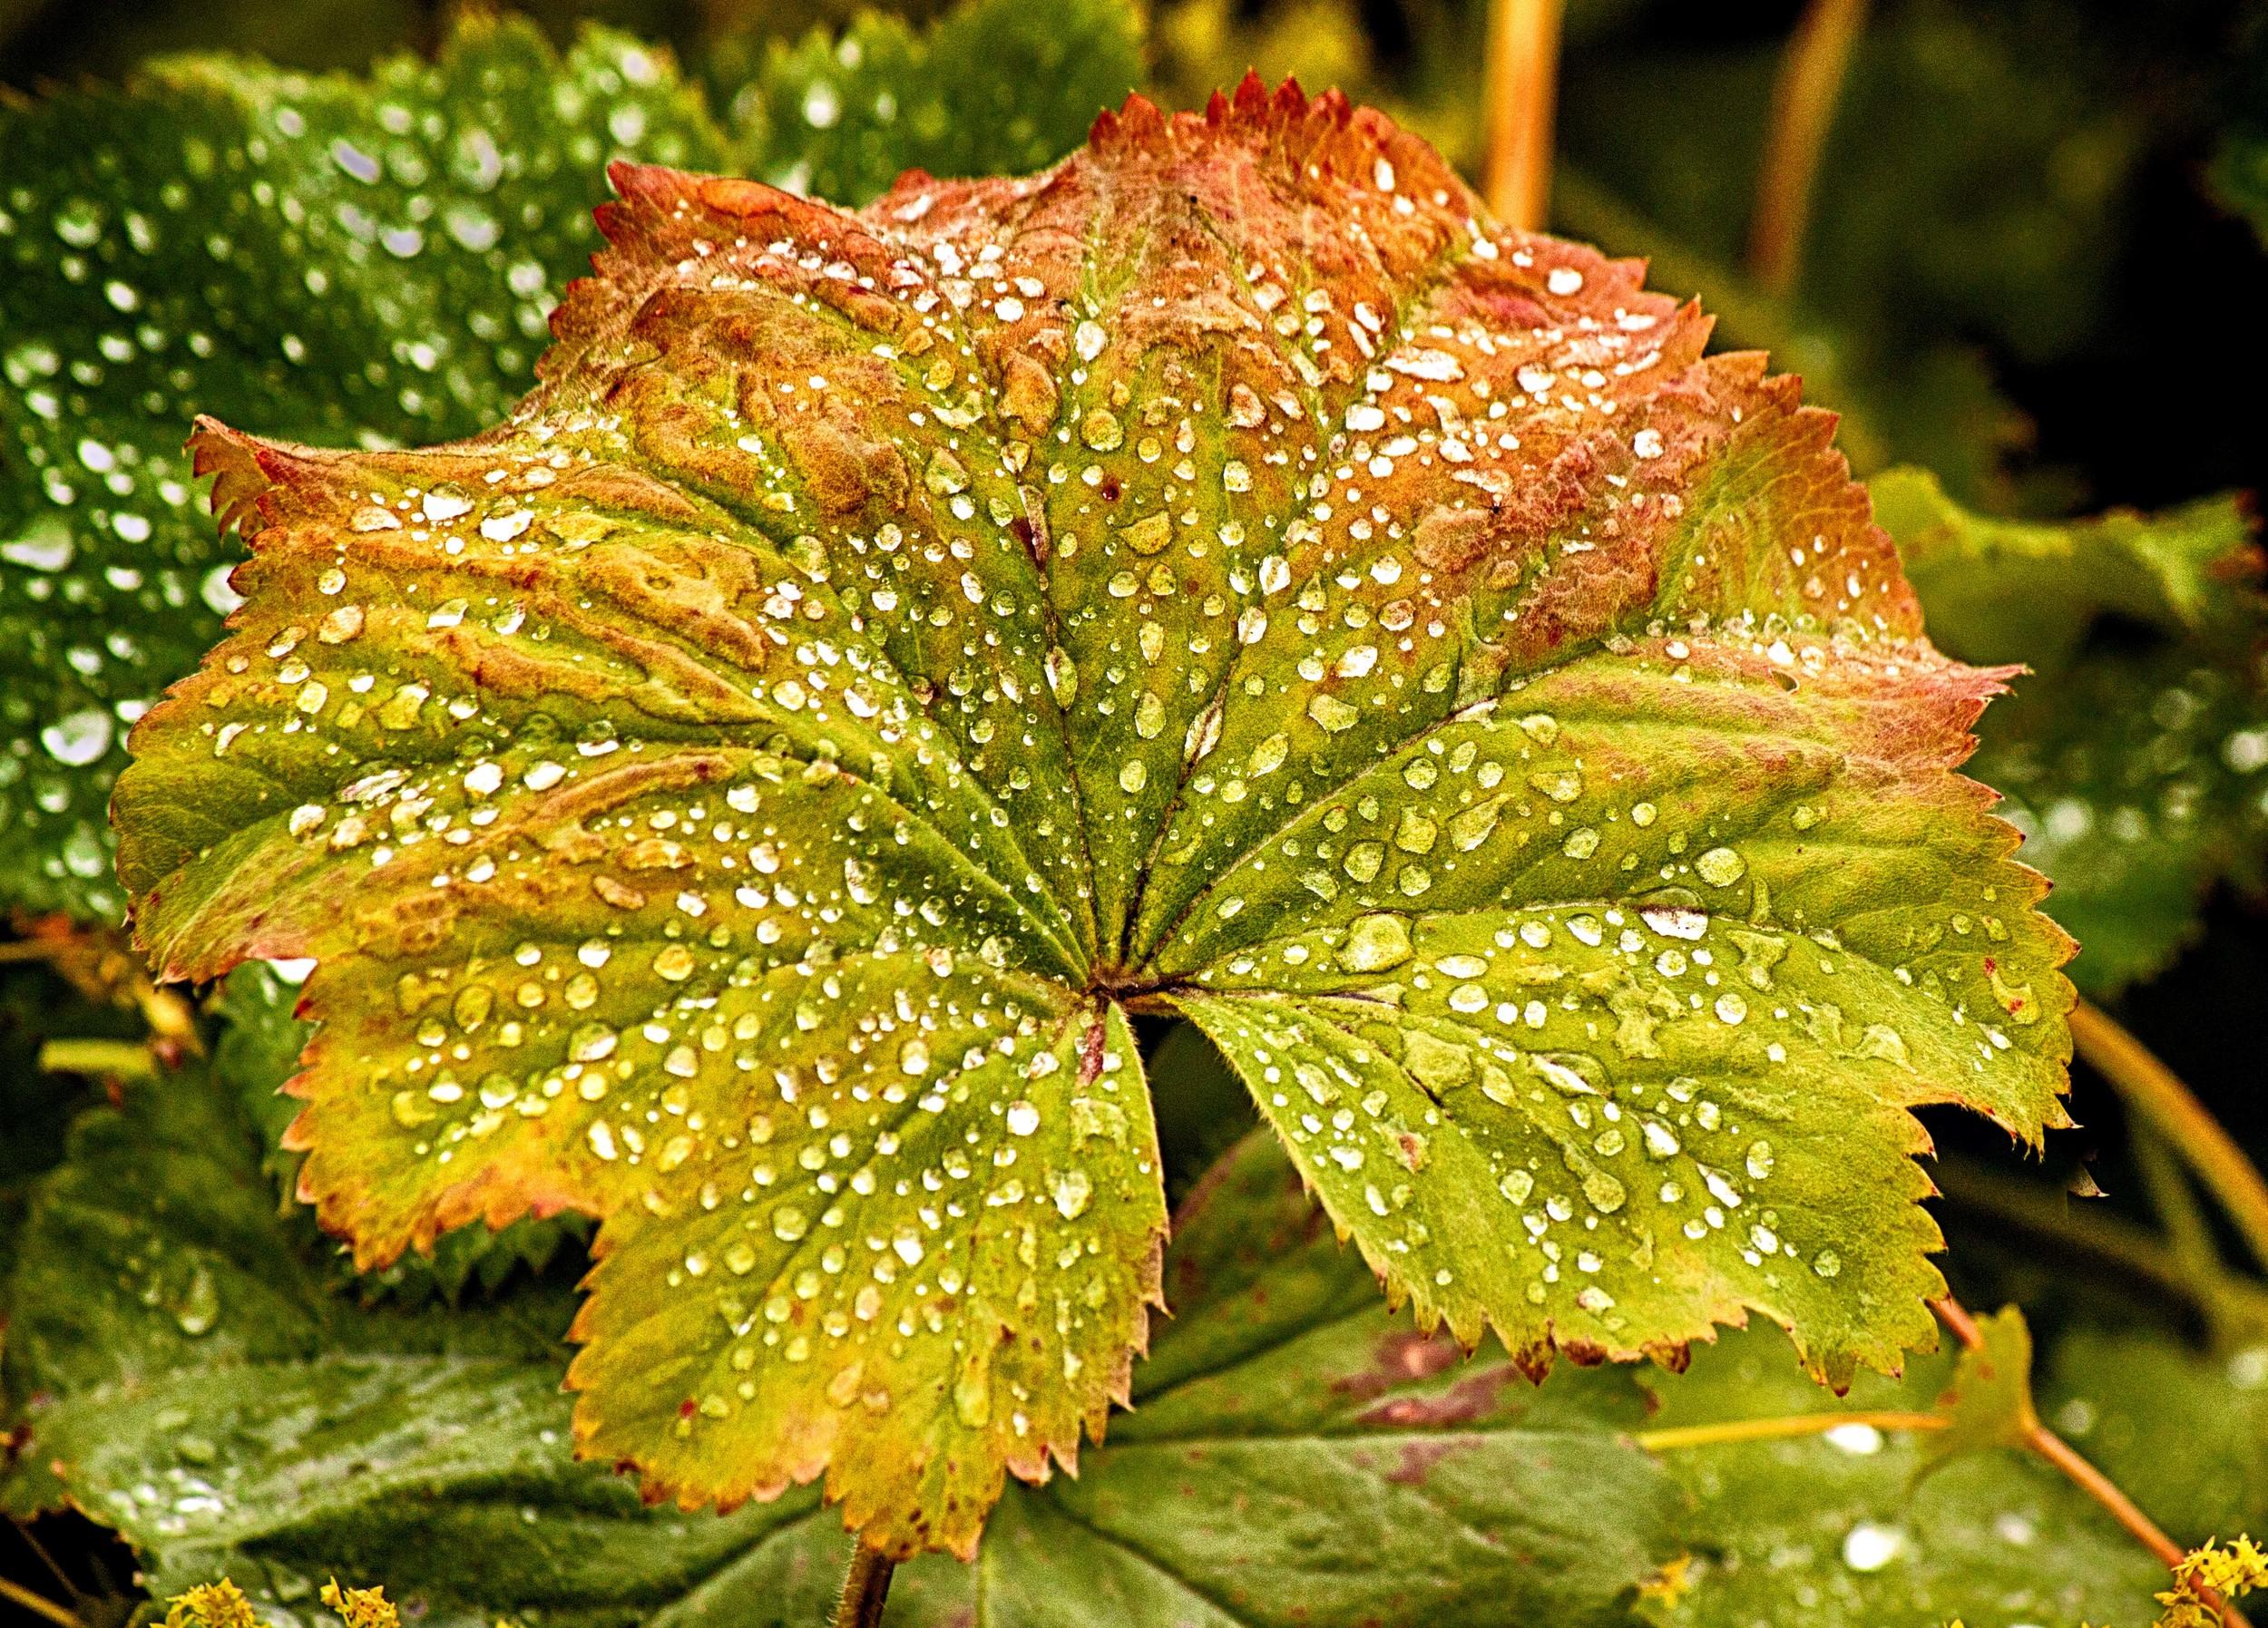 Leaf with Raindrops.jpg